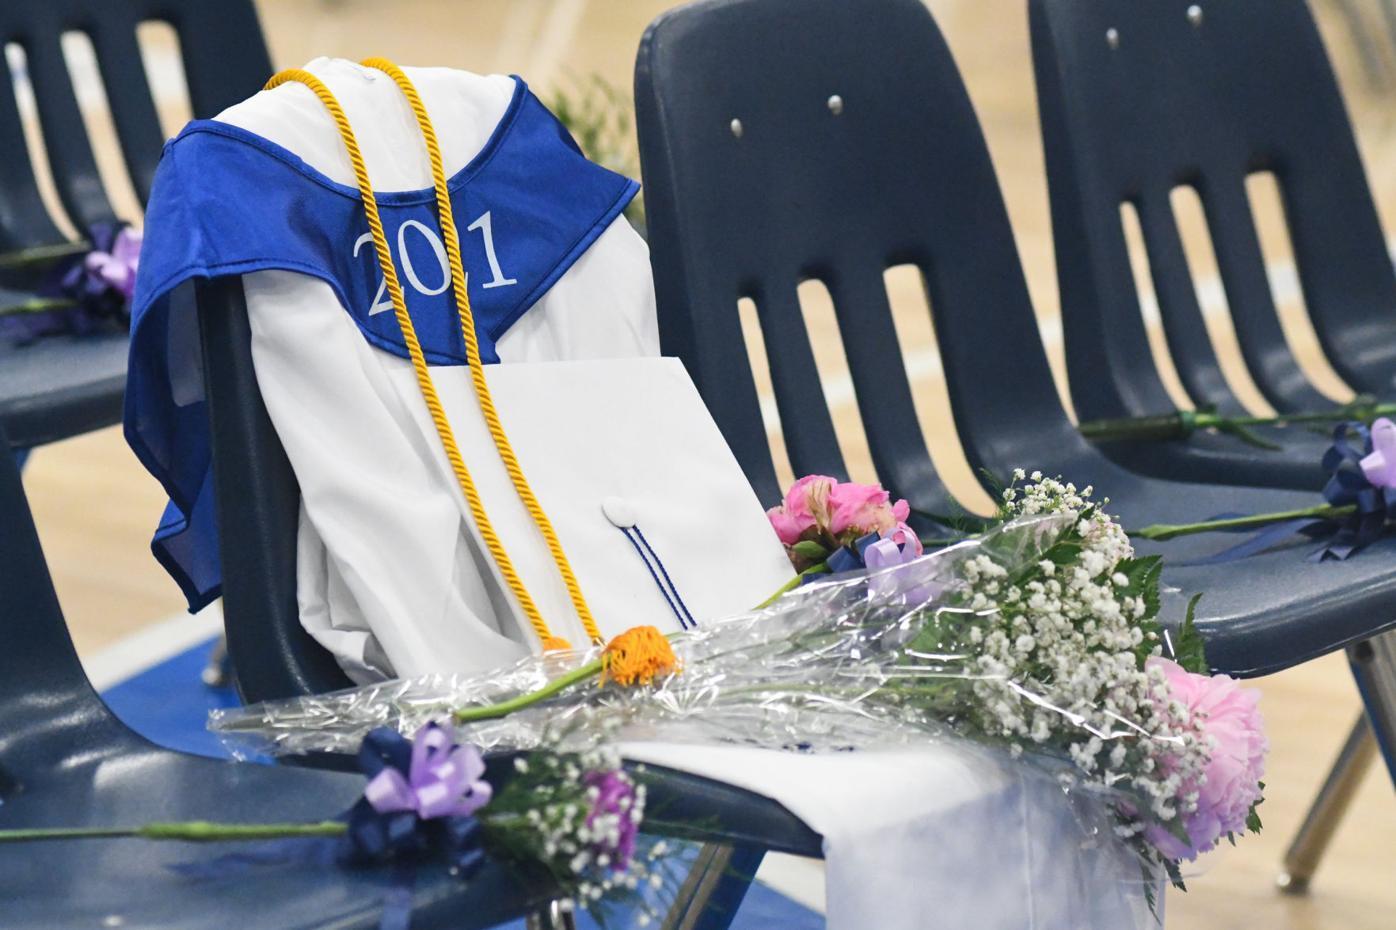 Williams Valley Graduation